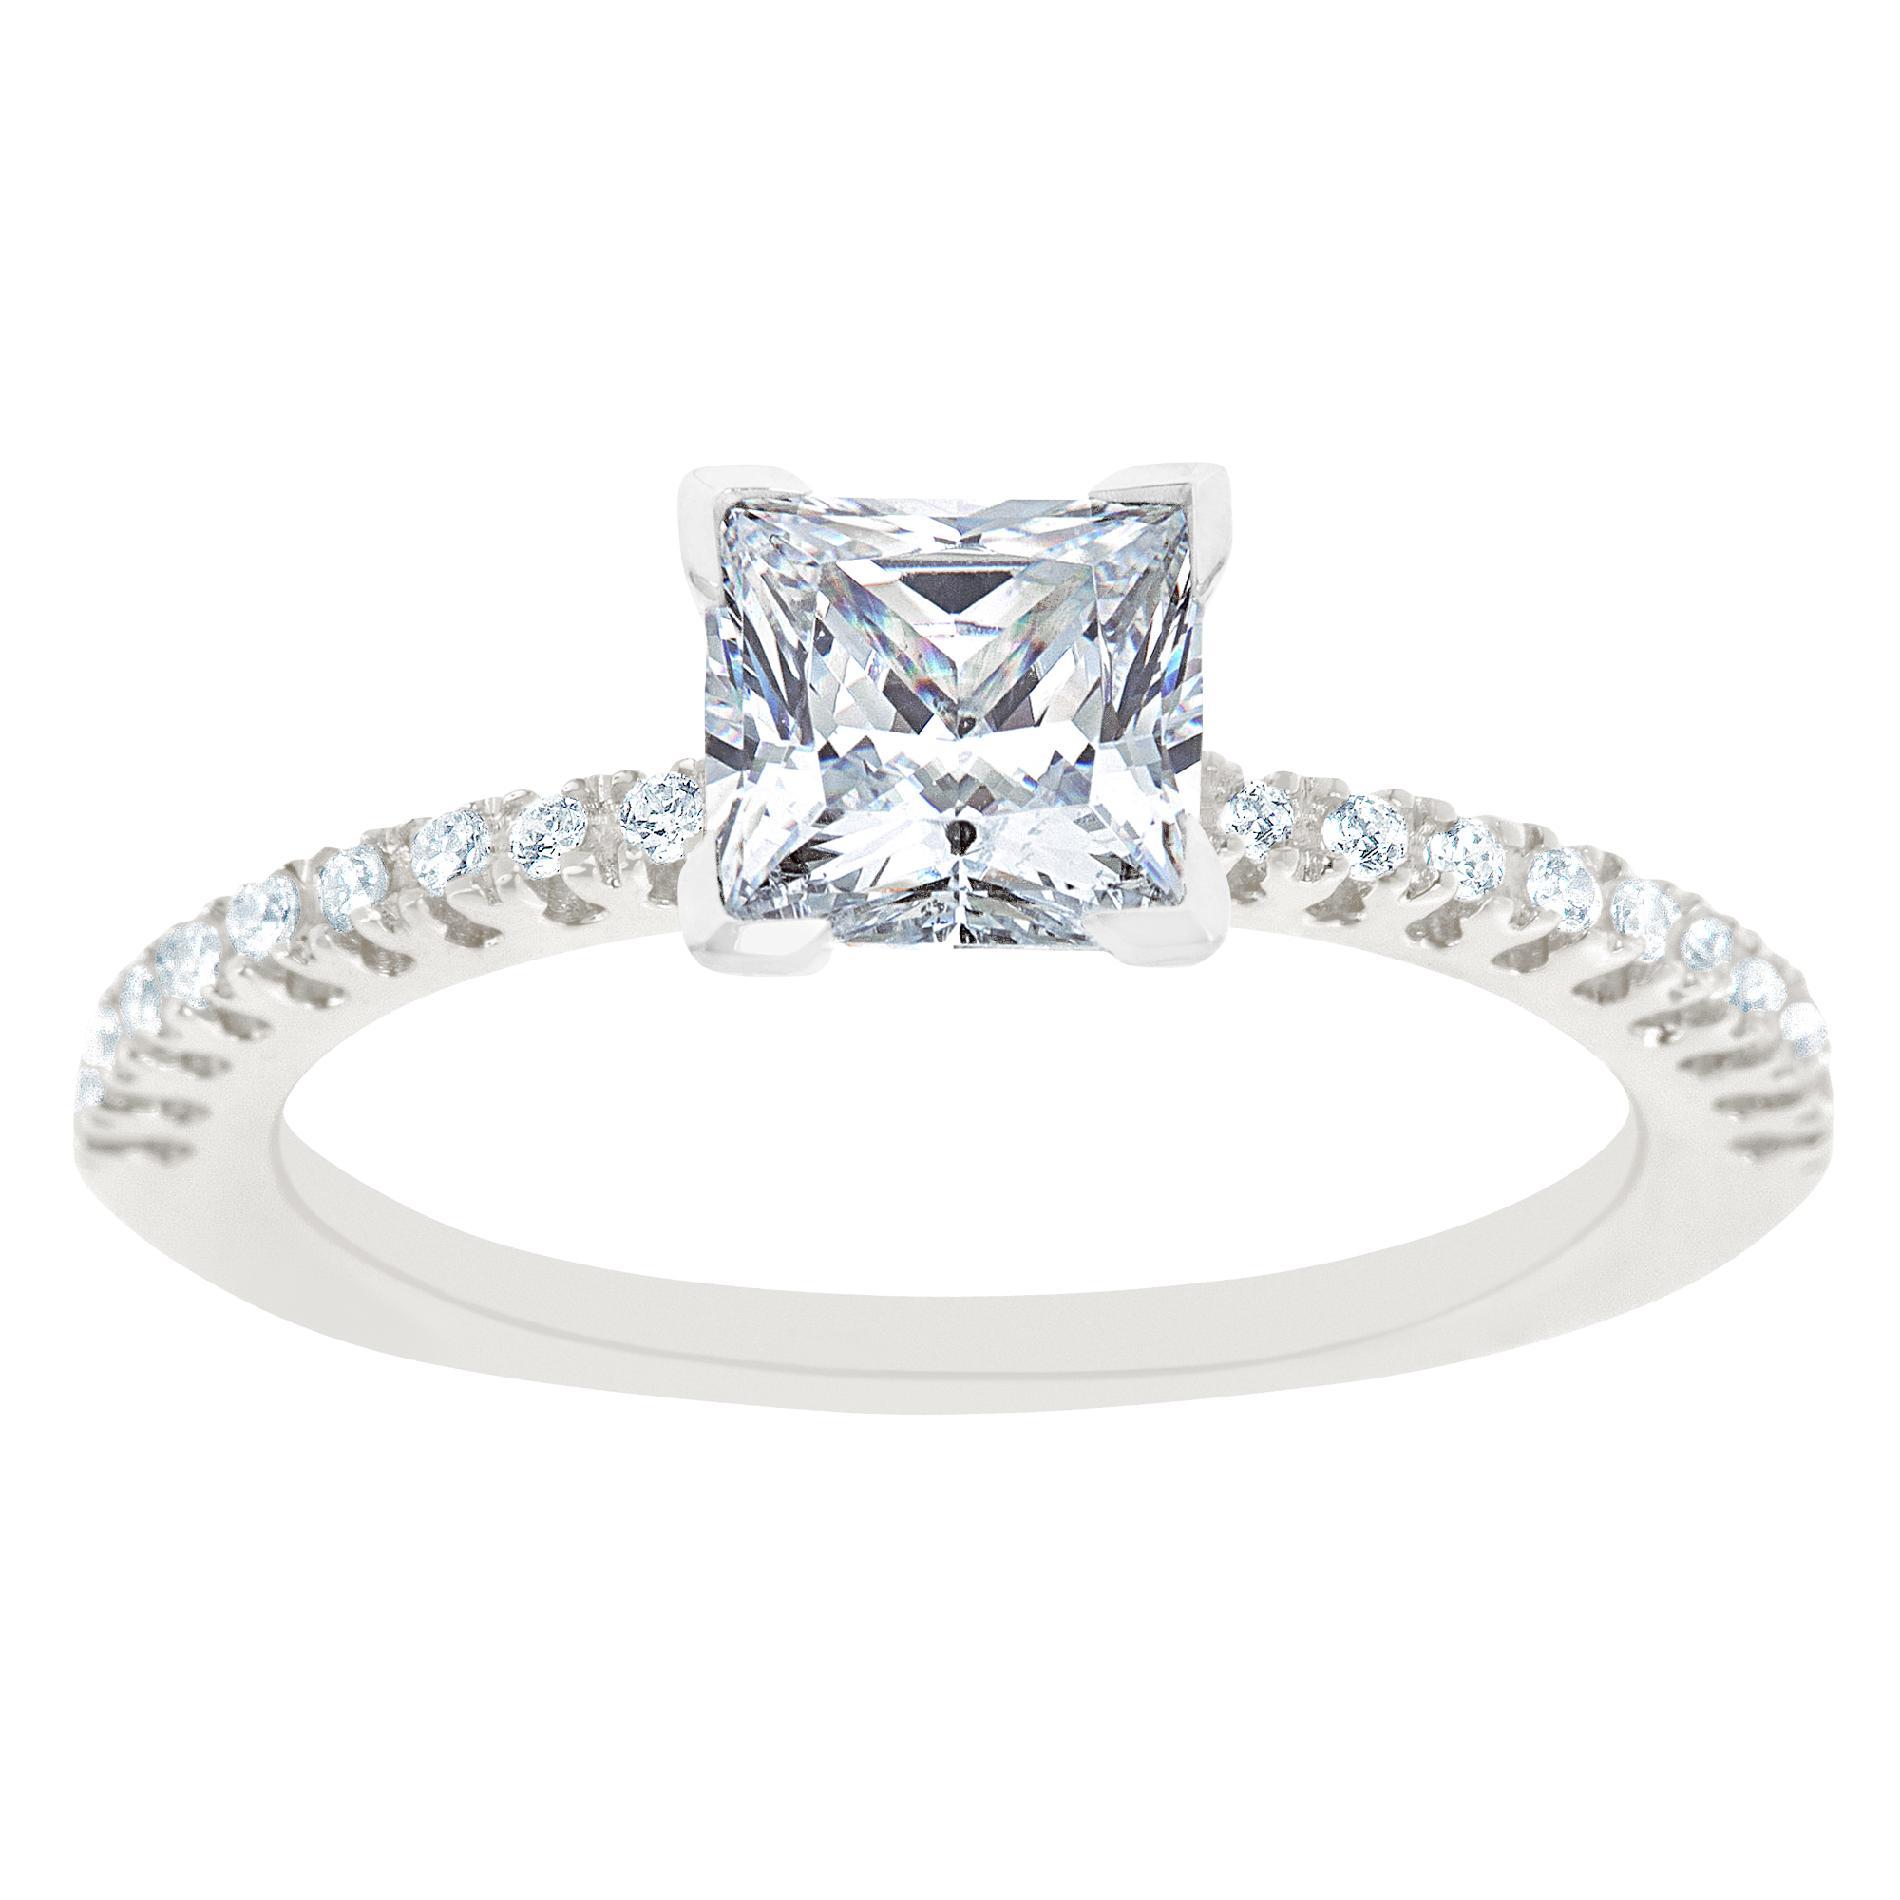 14K White Gold Princess Cut Certified Diamond Engagement Ring